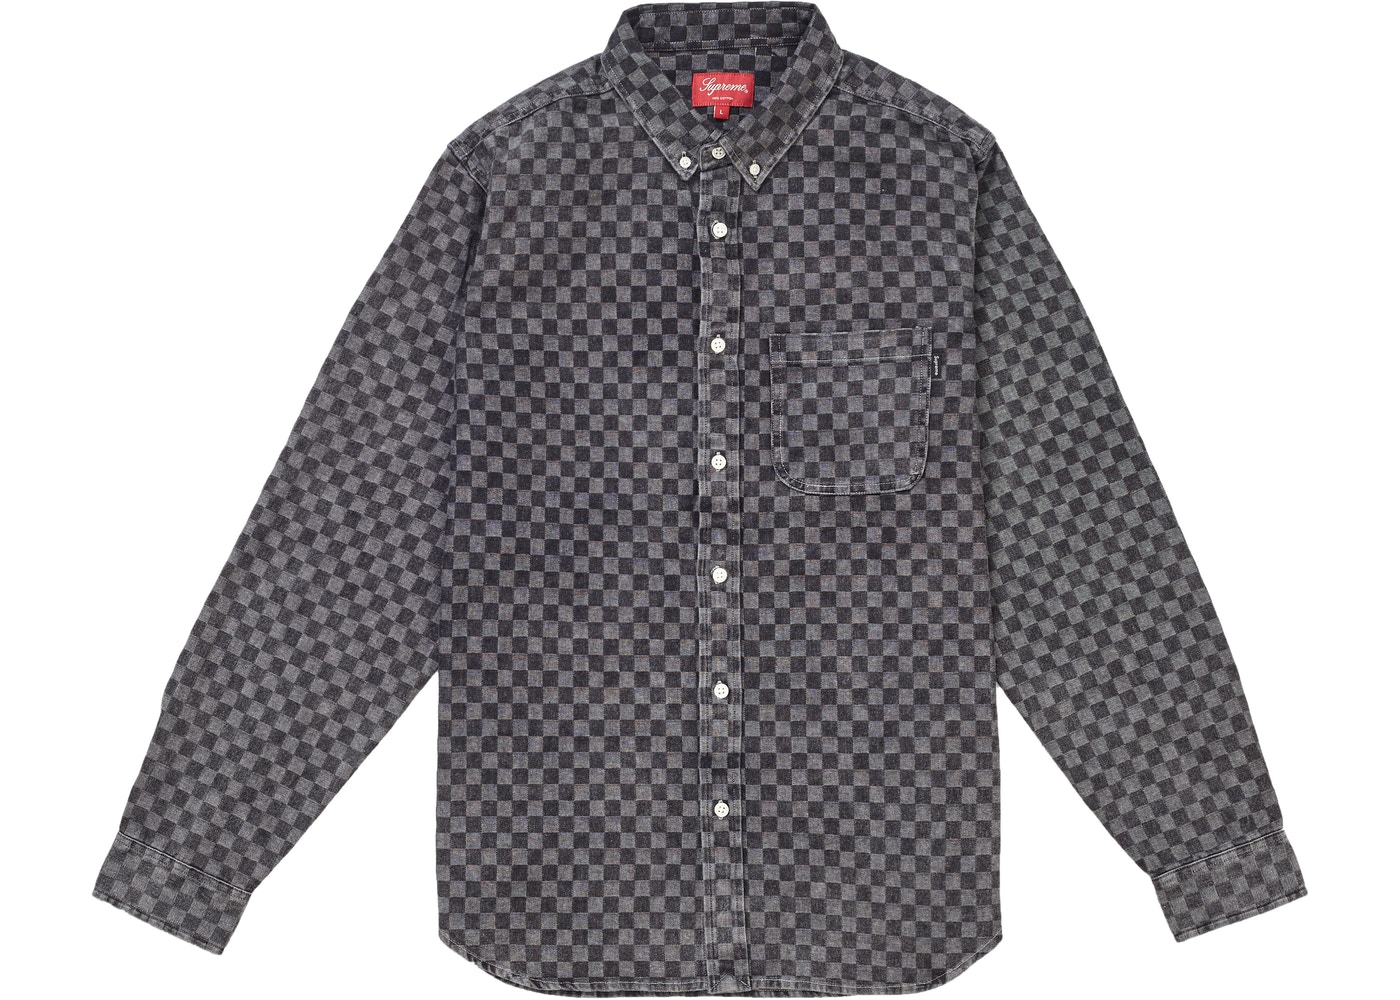 3b53265f8d58 Supreme Checkered Denim Shirt Black - FW18